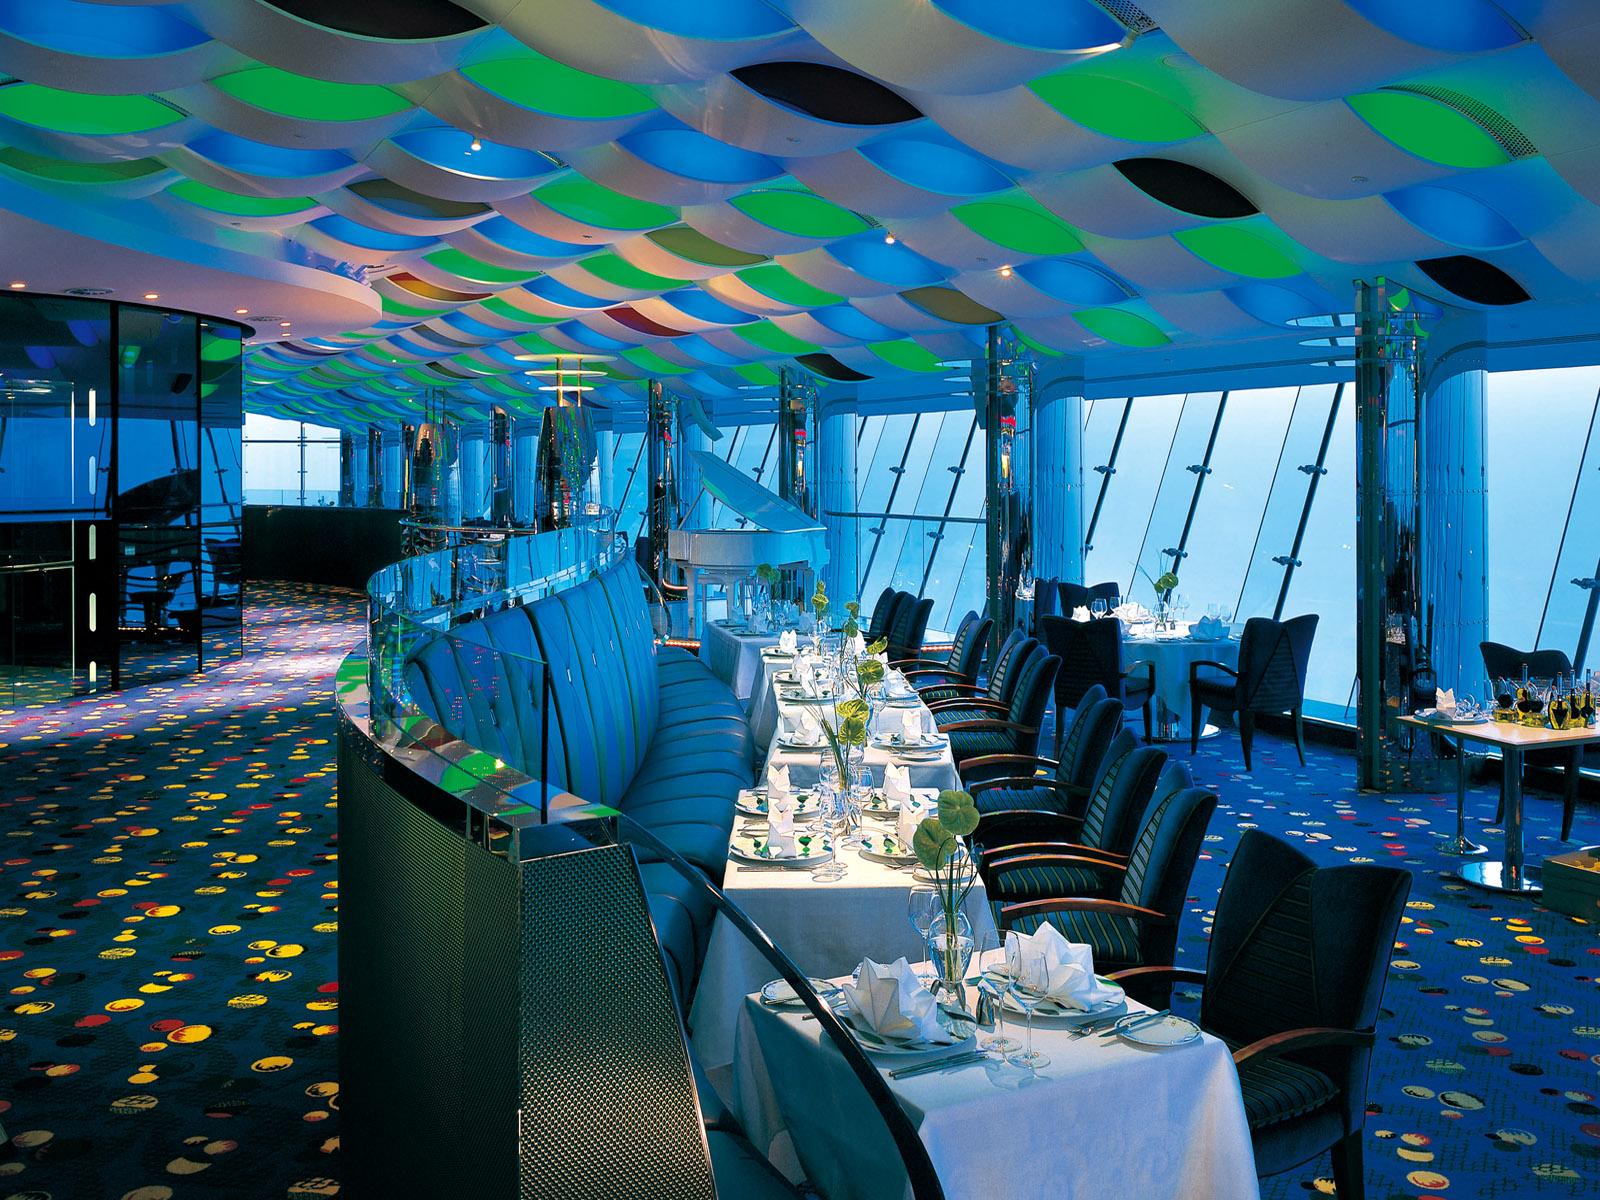 Famous interior design interior design burj al arab dubai for Hotel design dubai